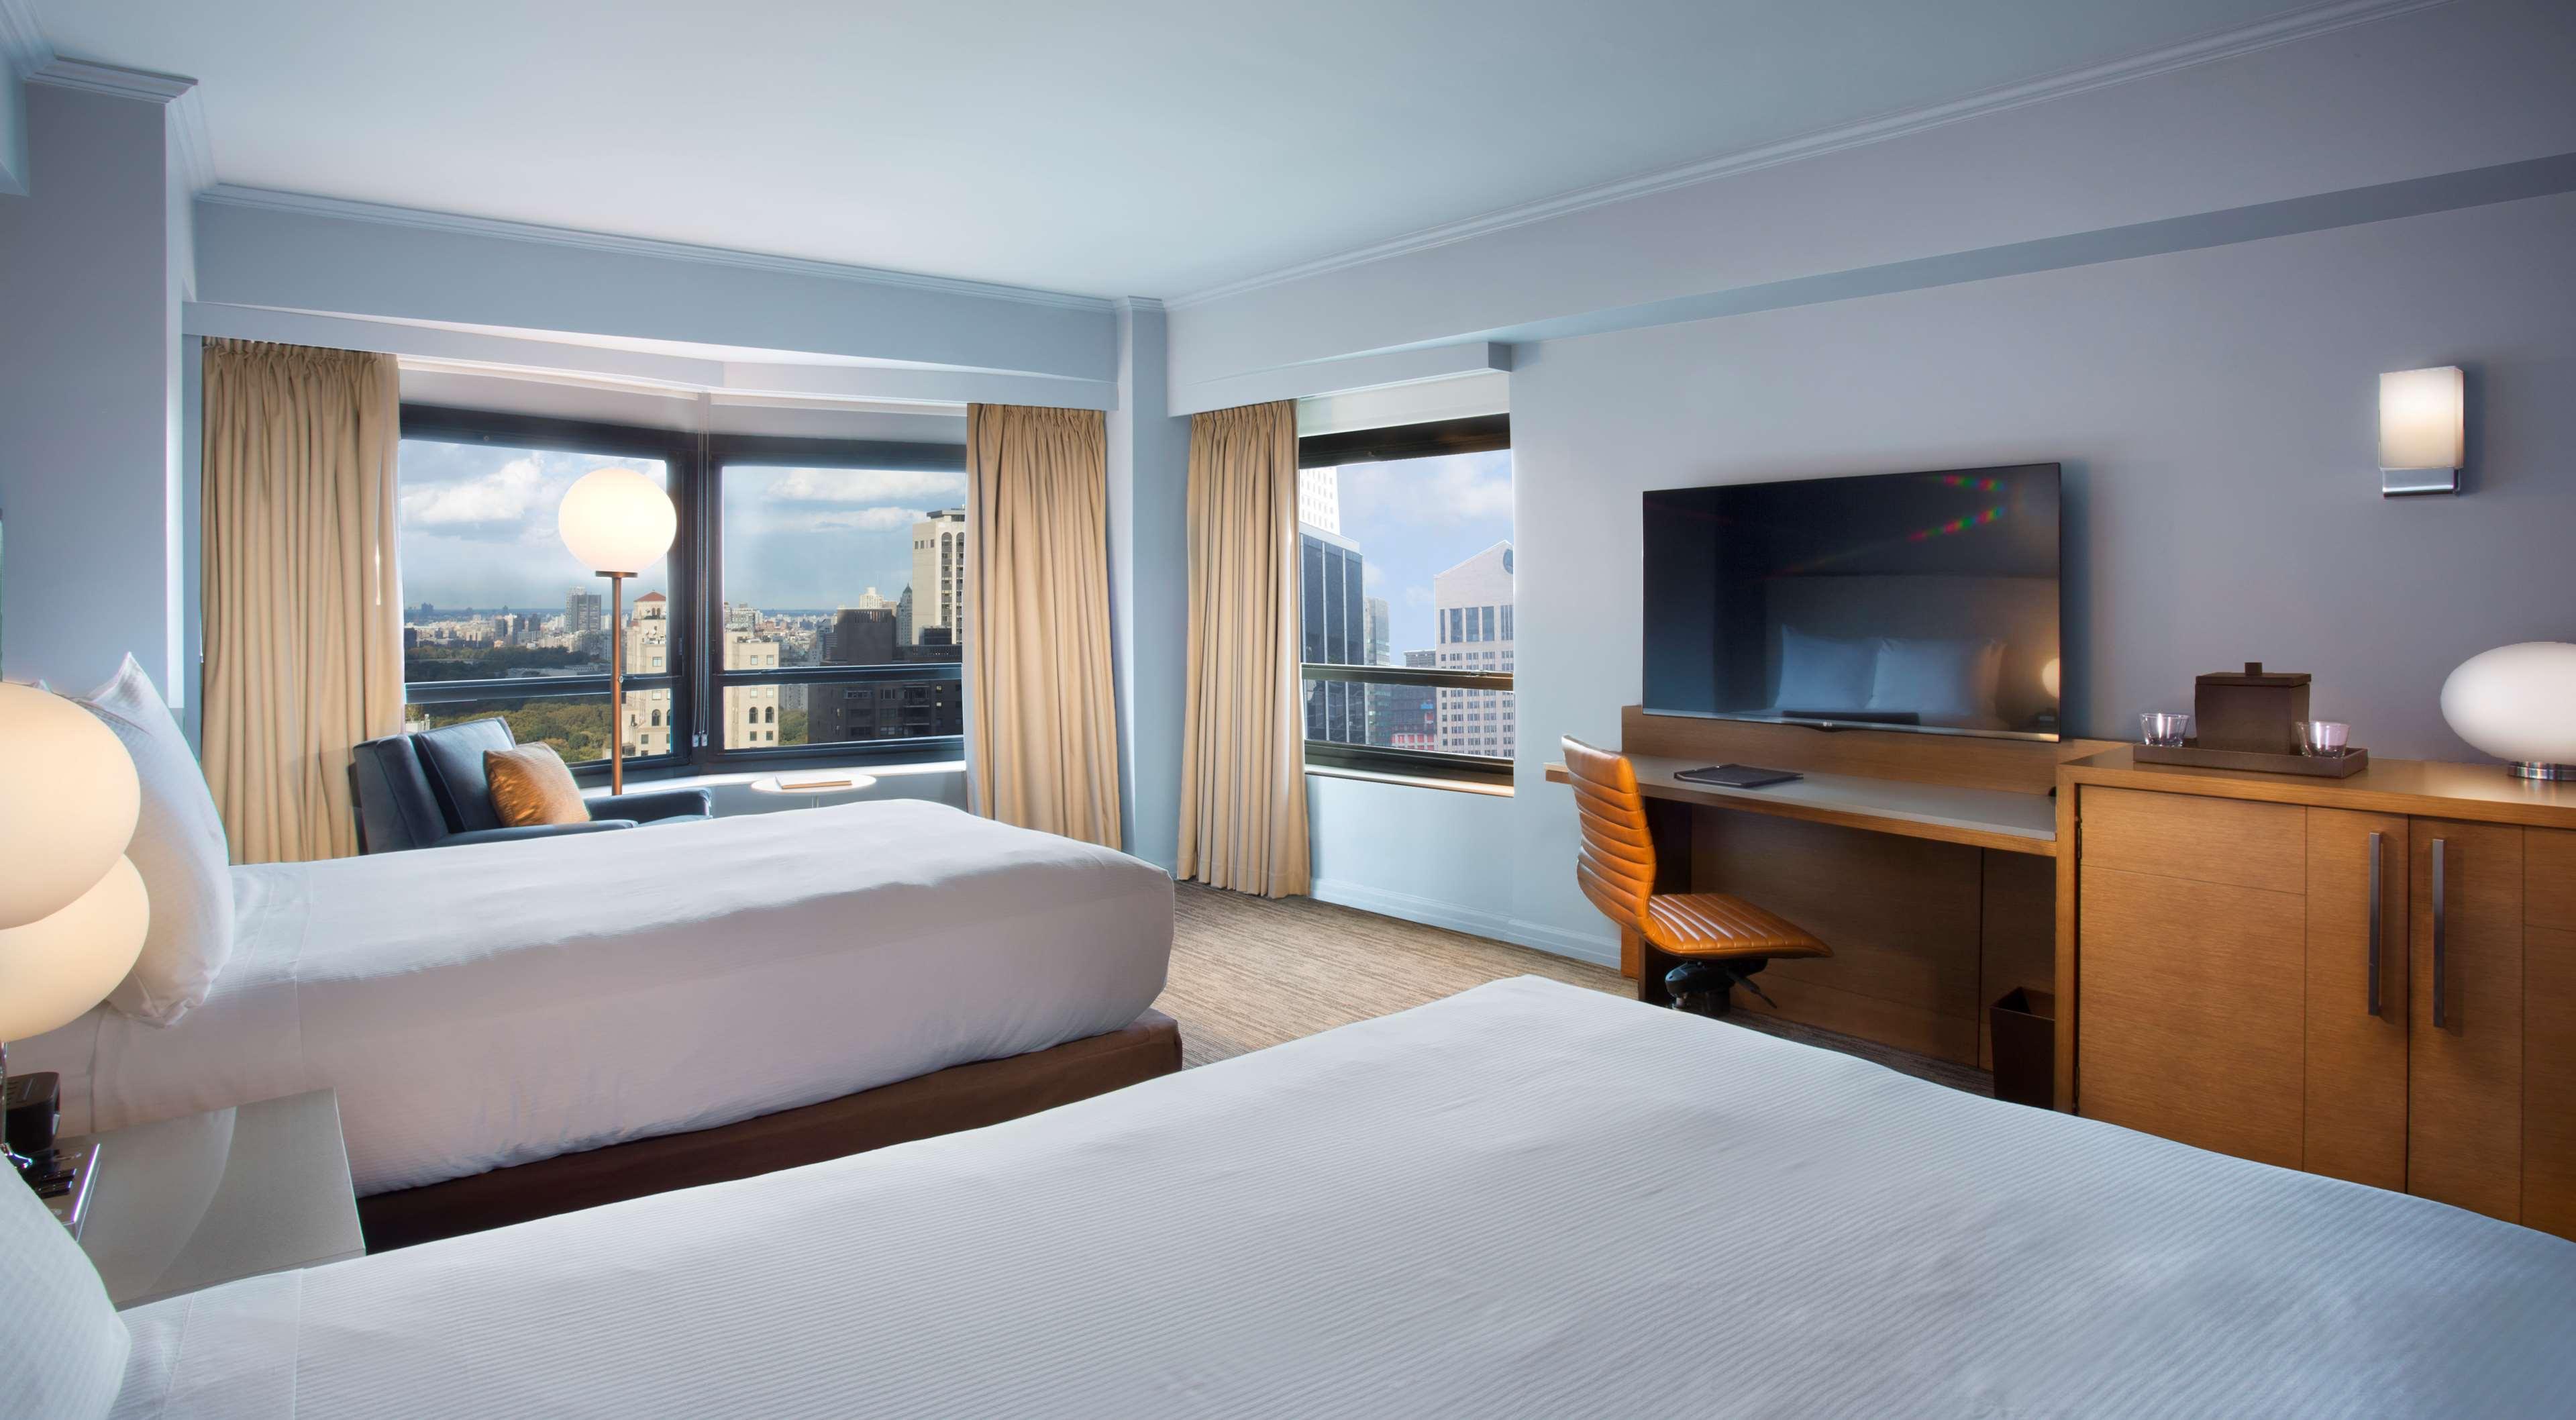 New York Hilton Midtown image 41